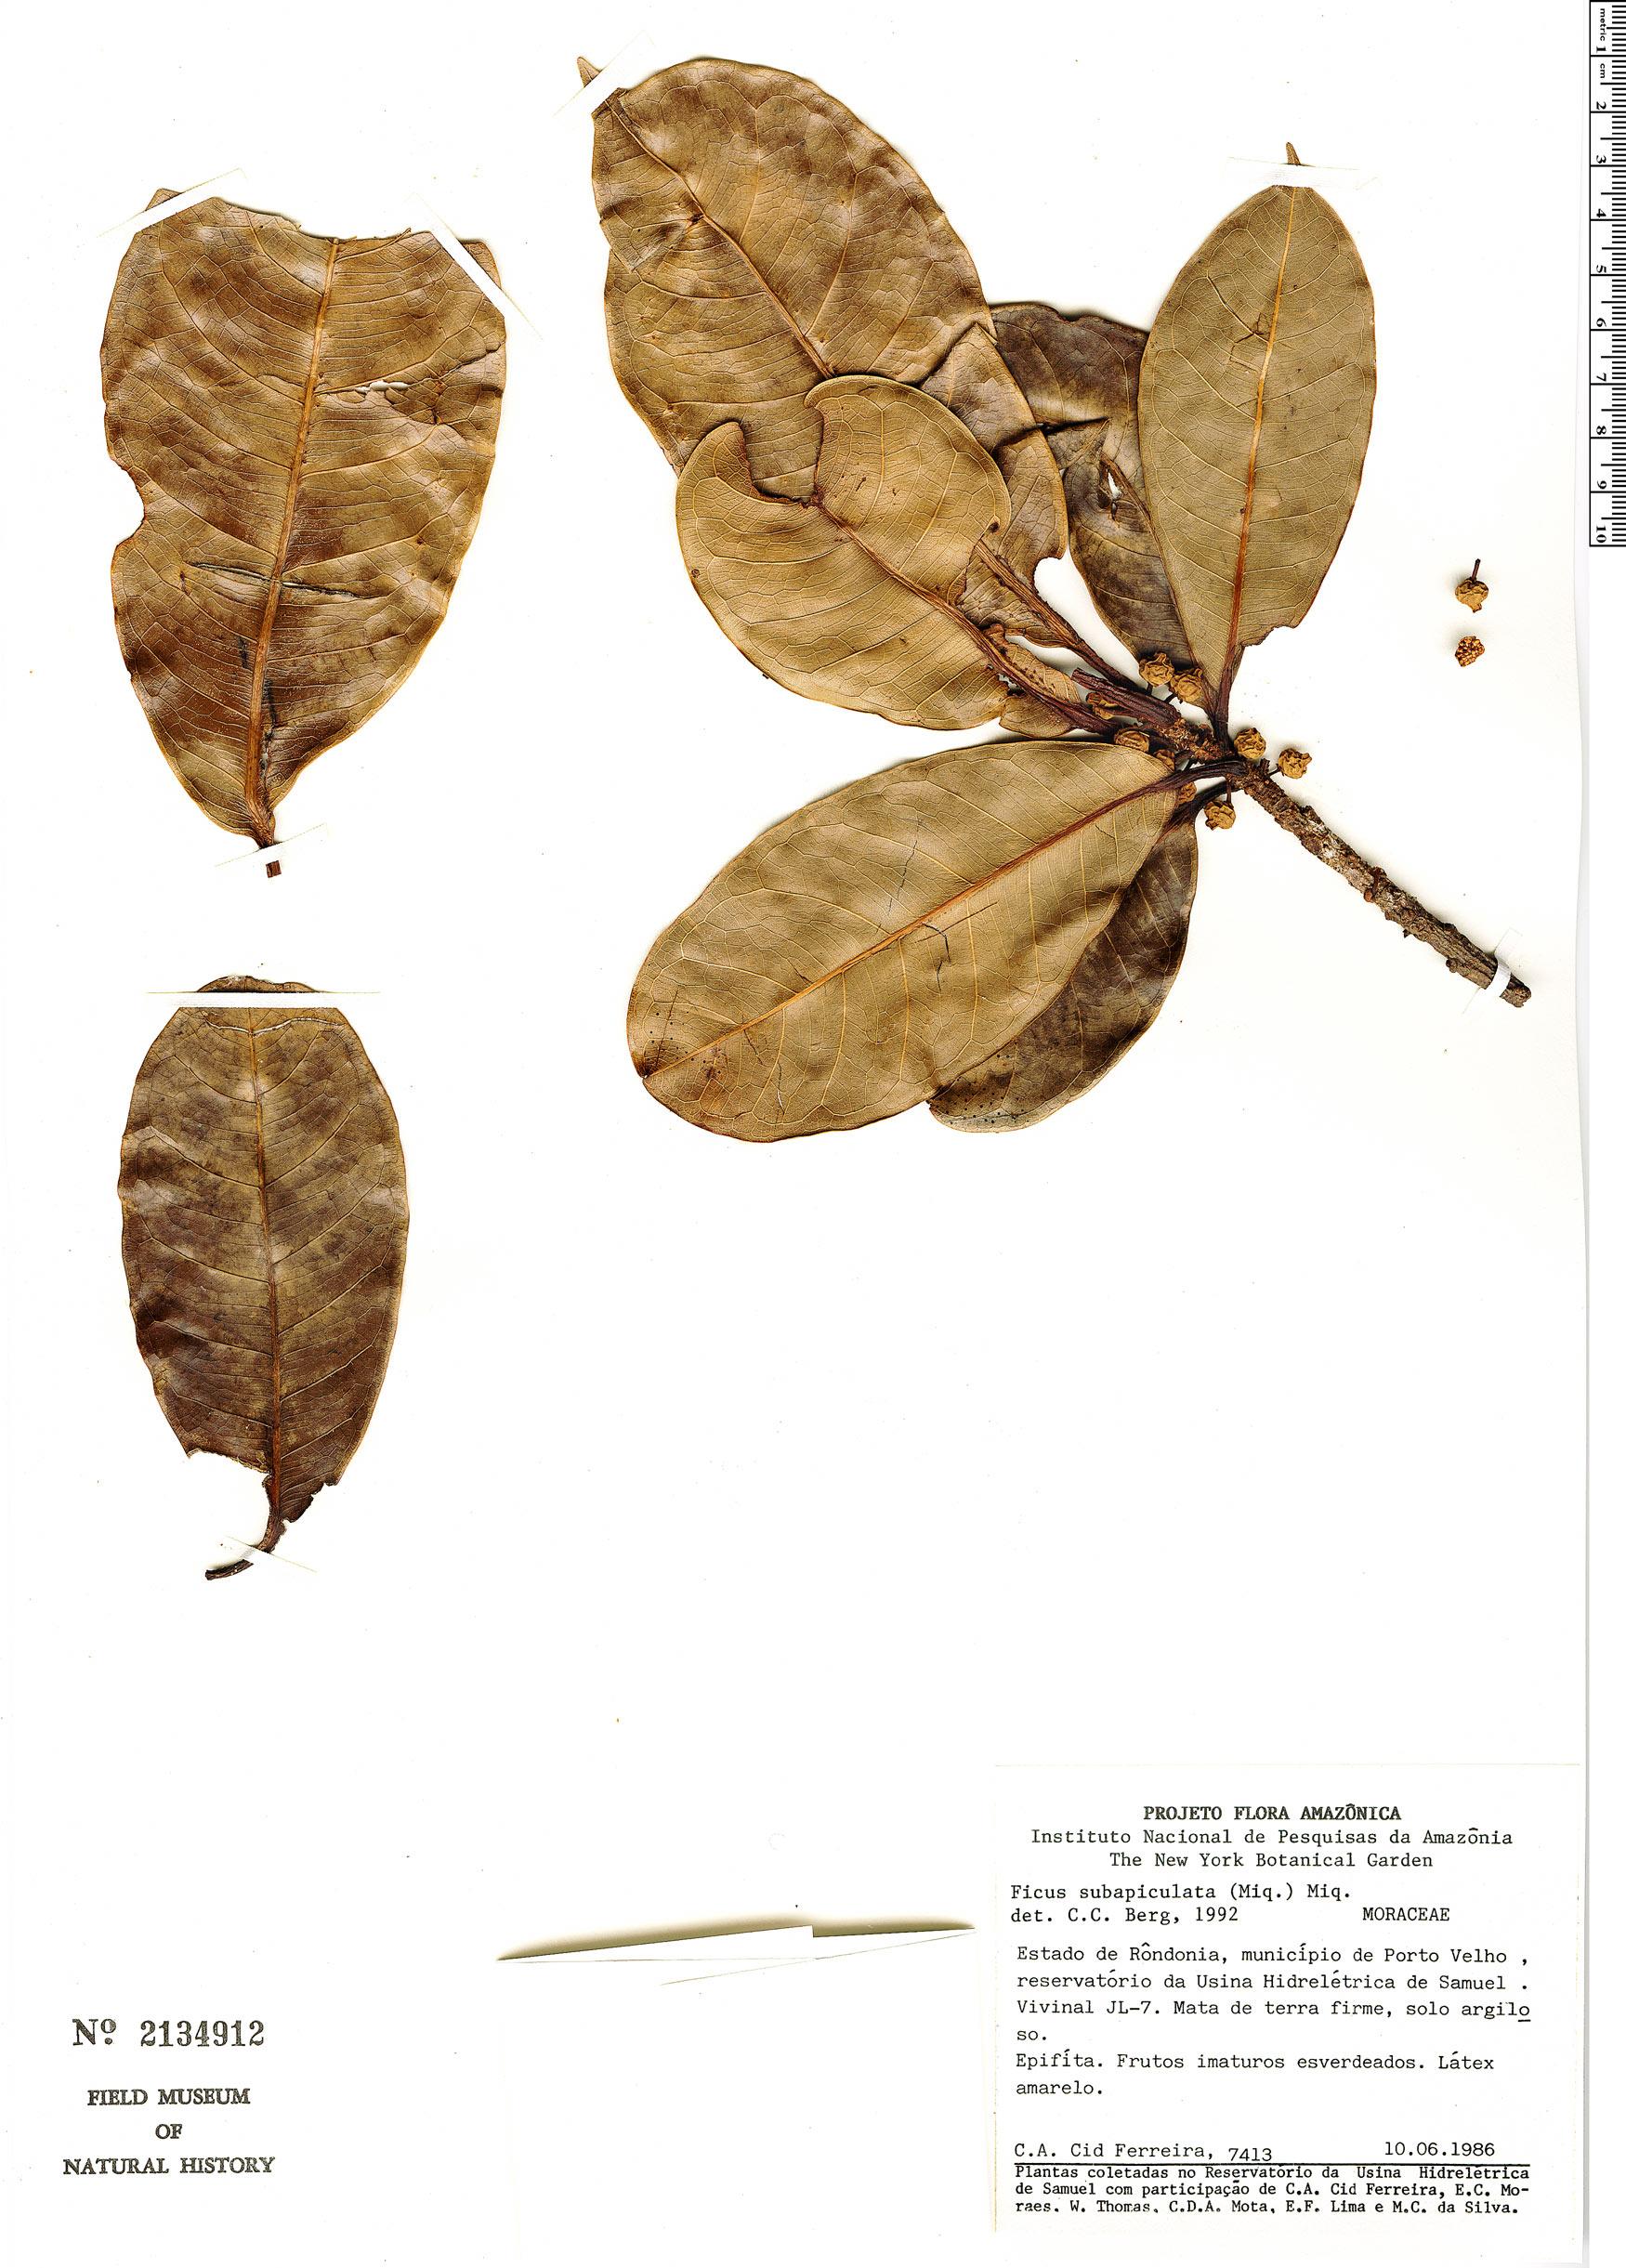 Specimen: Ficus americana